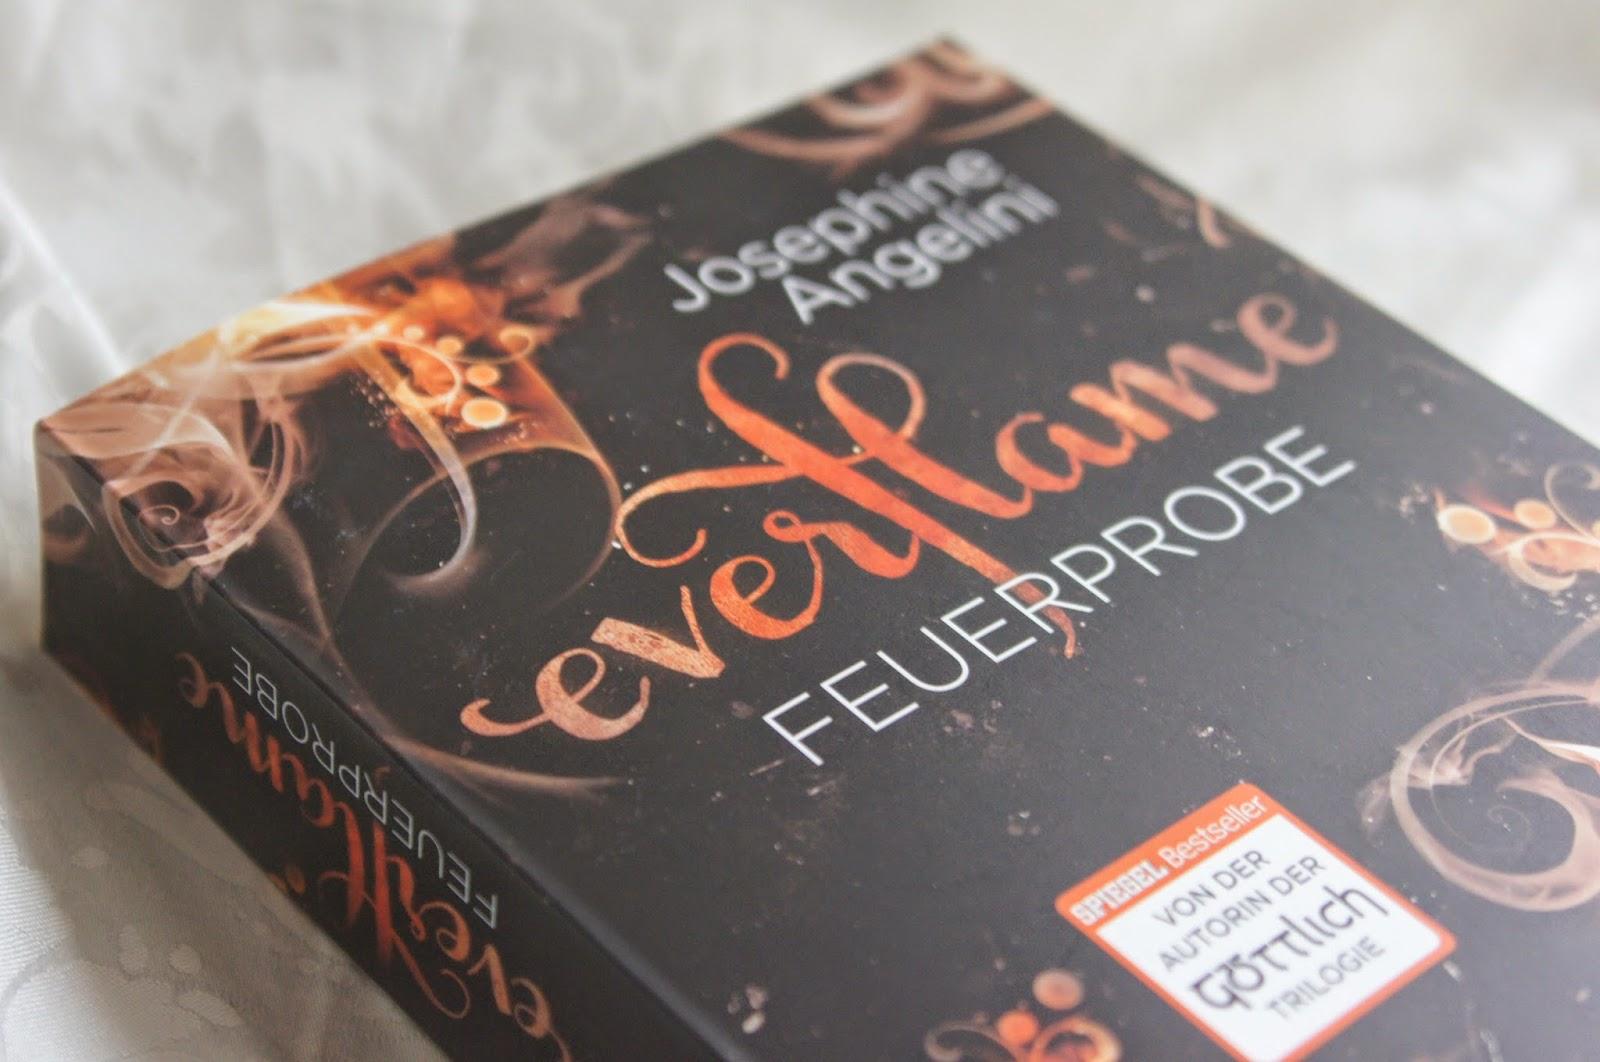 everflame - Feuerprobe, Josephine Angelini